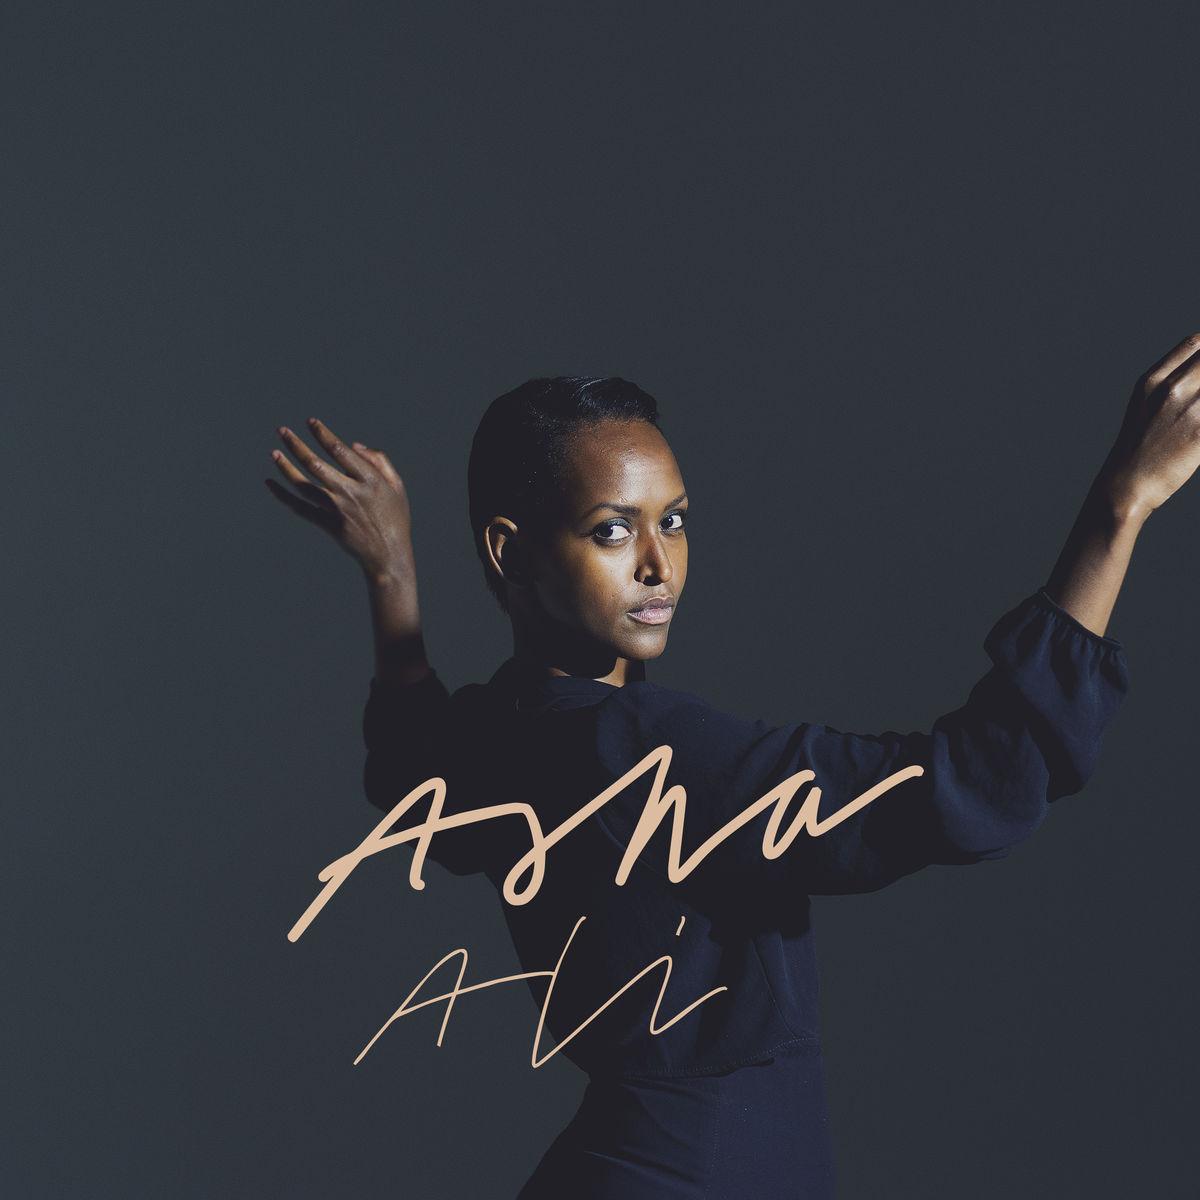 Asha Alis Nya Album Har årets Omslag